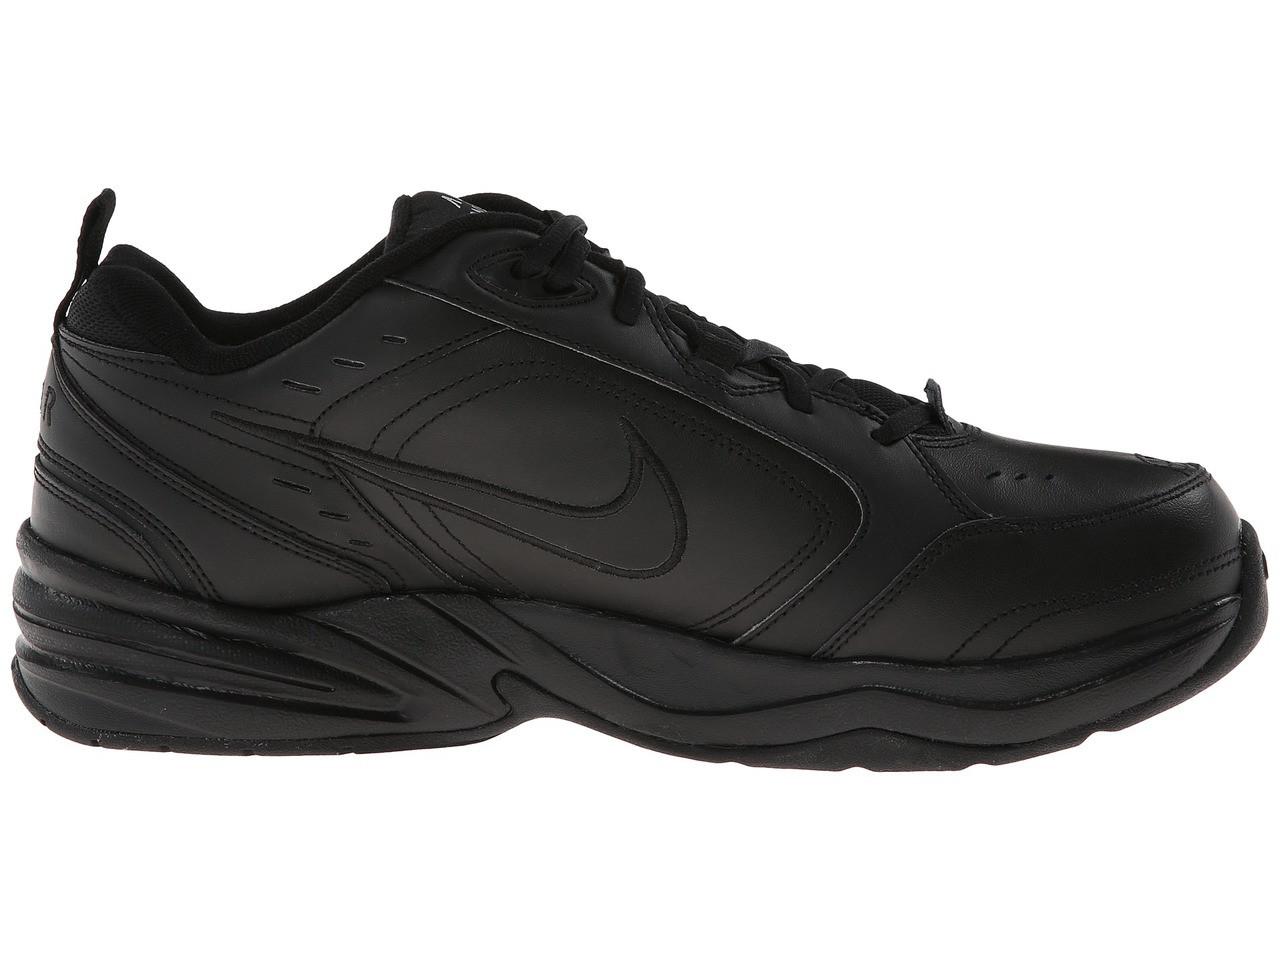 Trainer Equipment Air Shoes Referee Basketball Nike q54wATn5